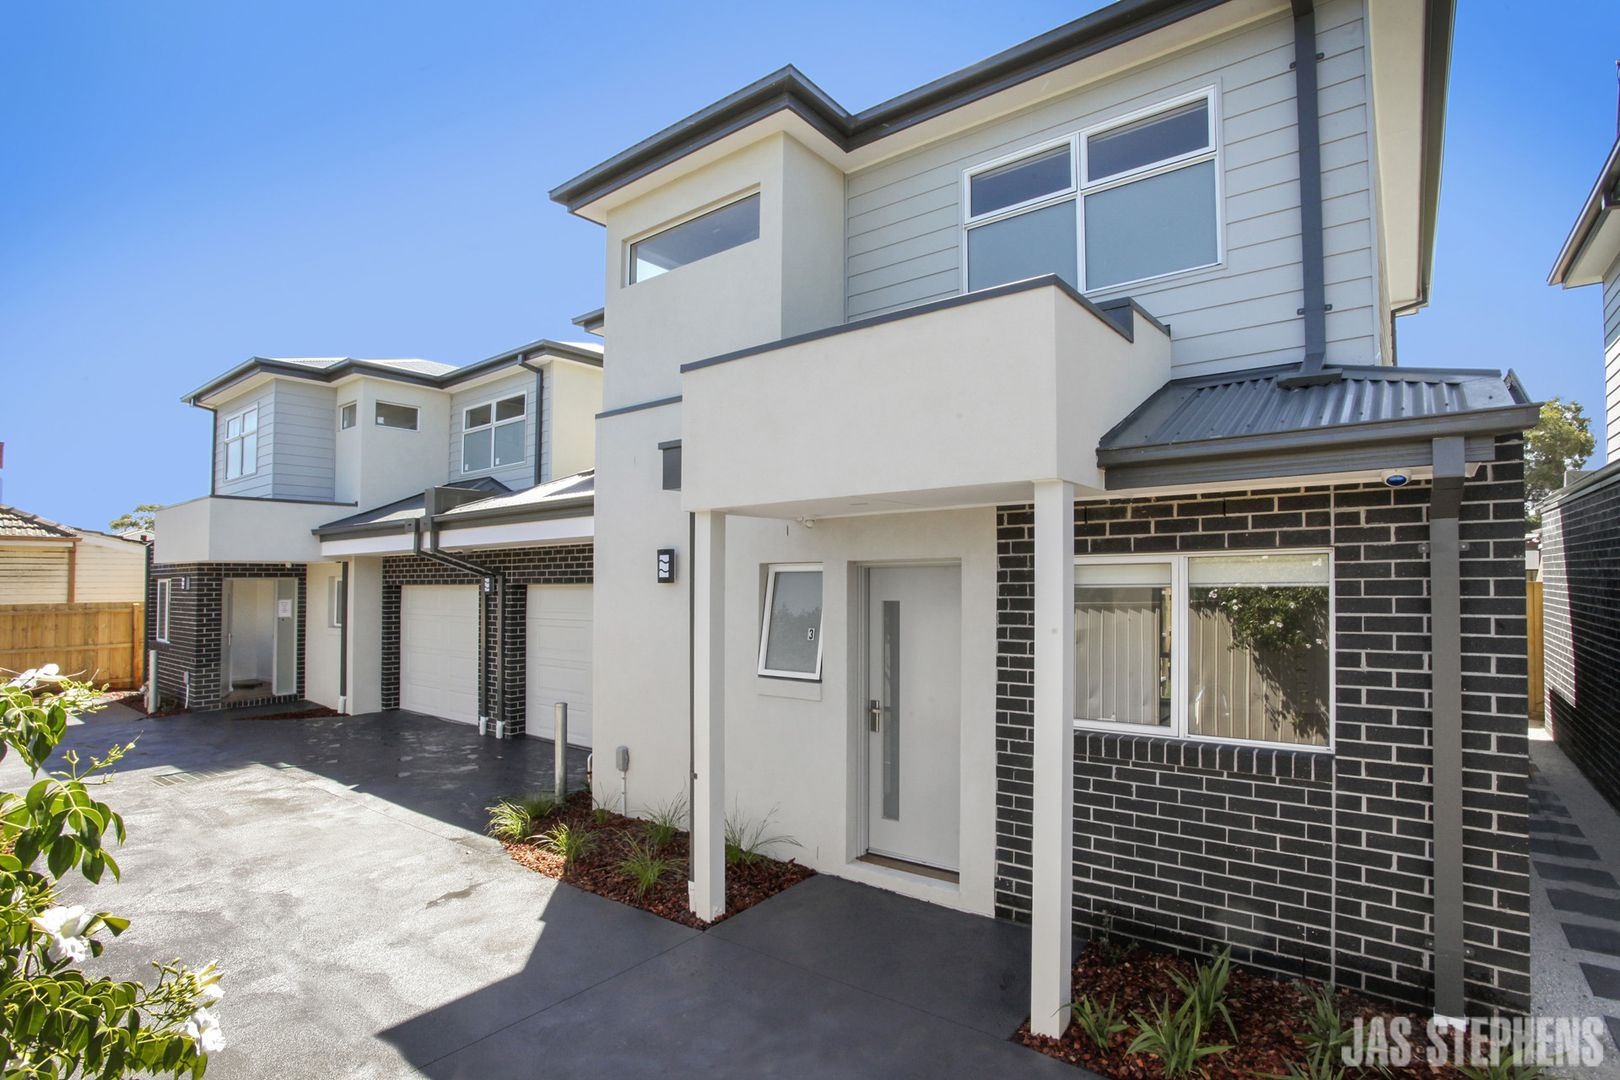 3/66 Roberts Street, West Footscray VIC 3012, Image 0